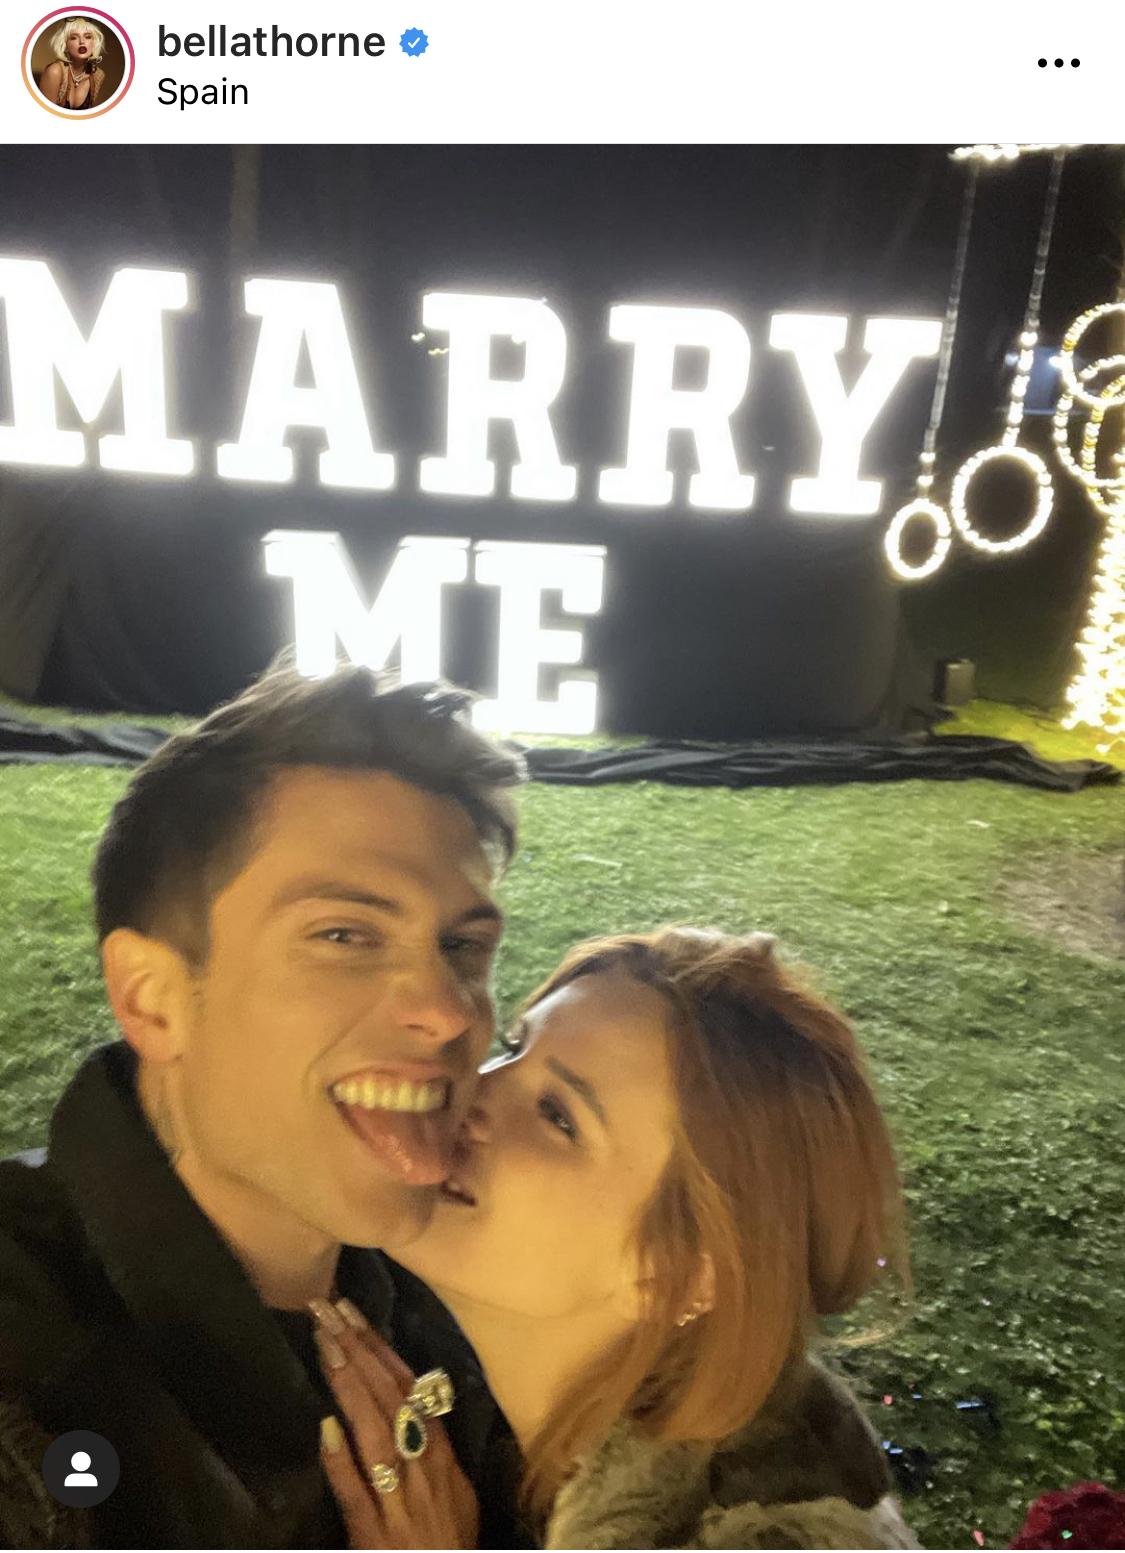 Former Disney Star Bella Thorne is Now Engaged